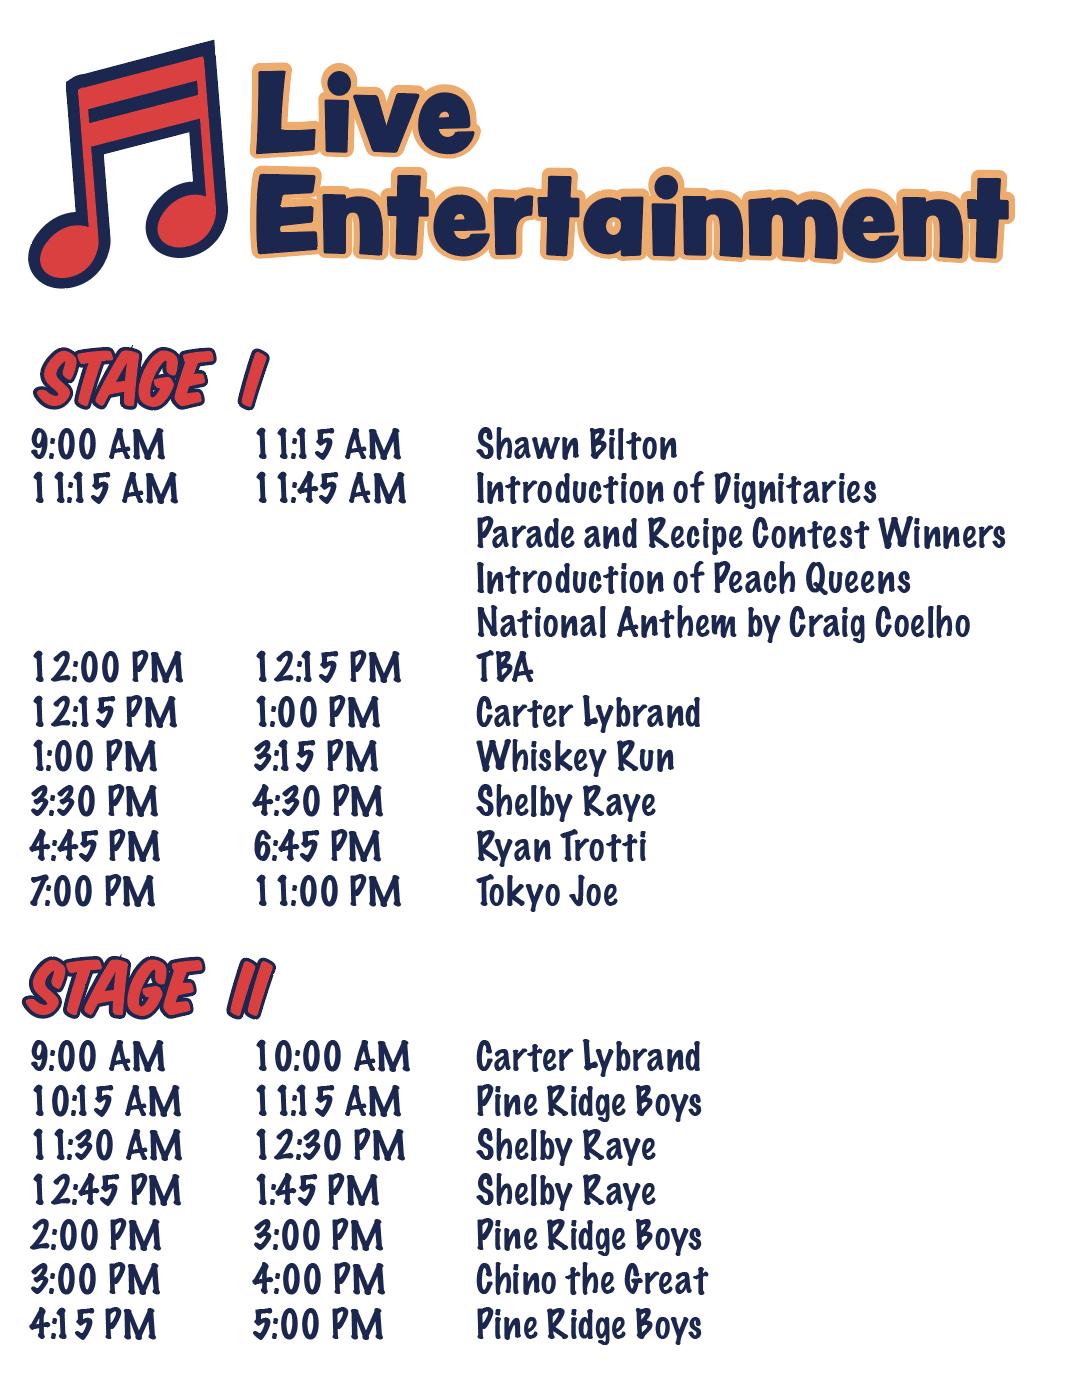 2019 Live Entertainment Lineup